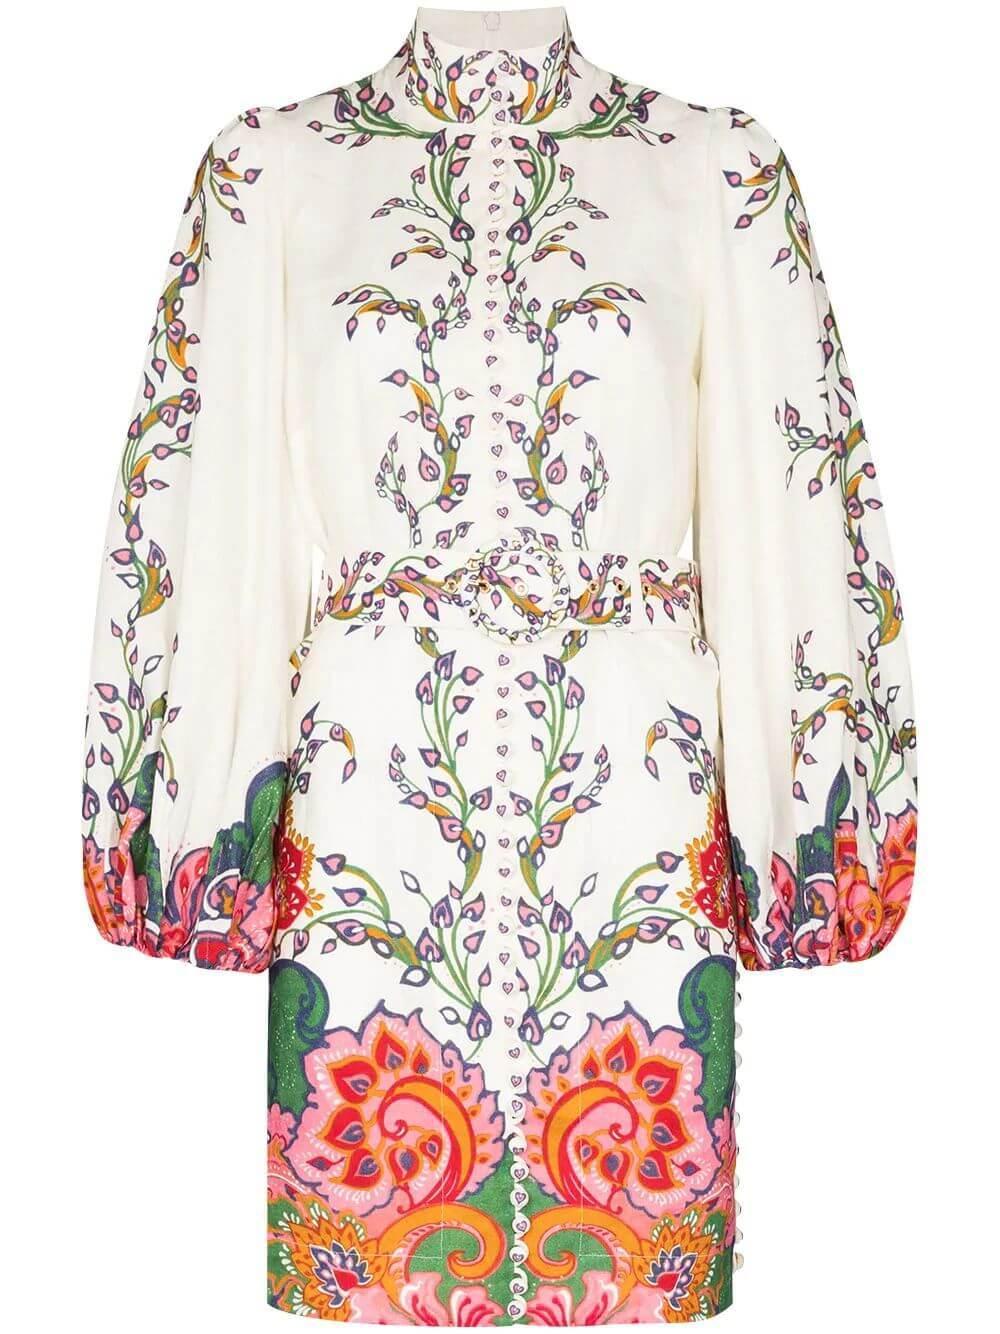 The Lovestruck Tunic Dress